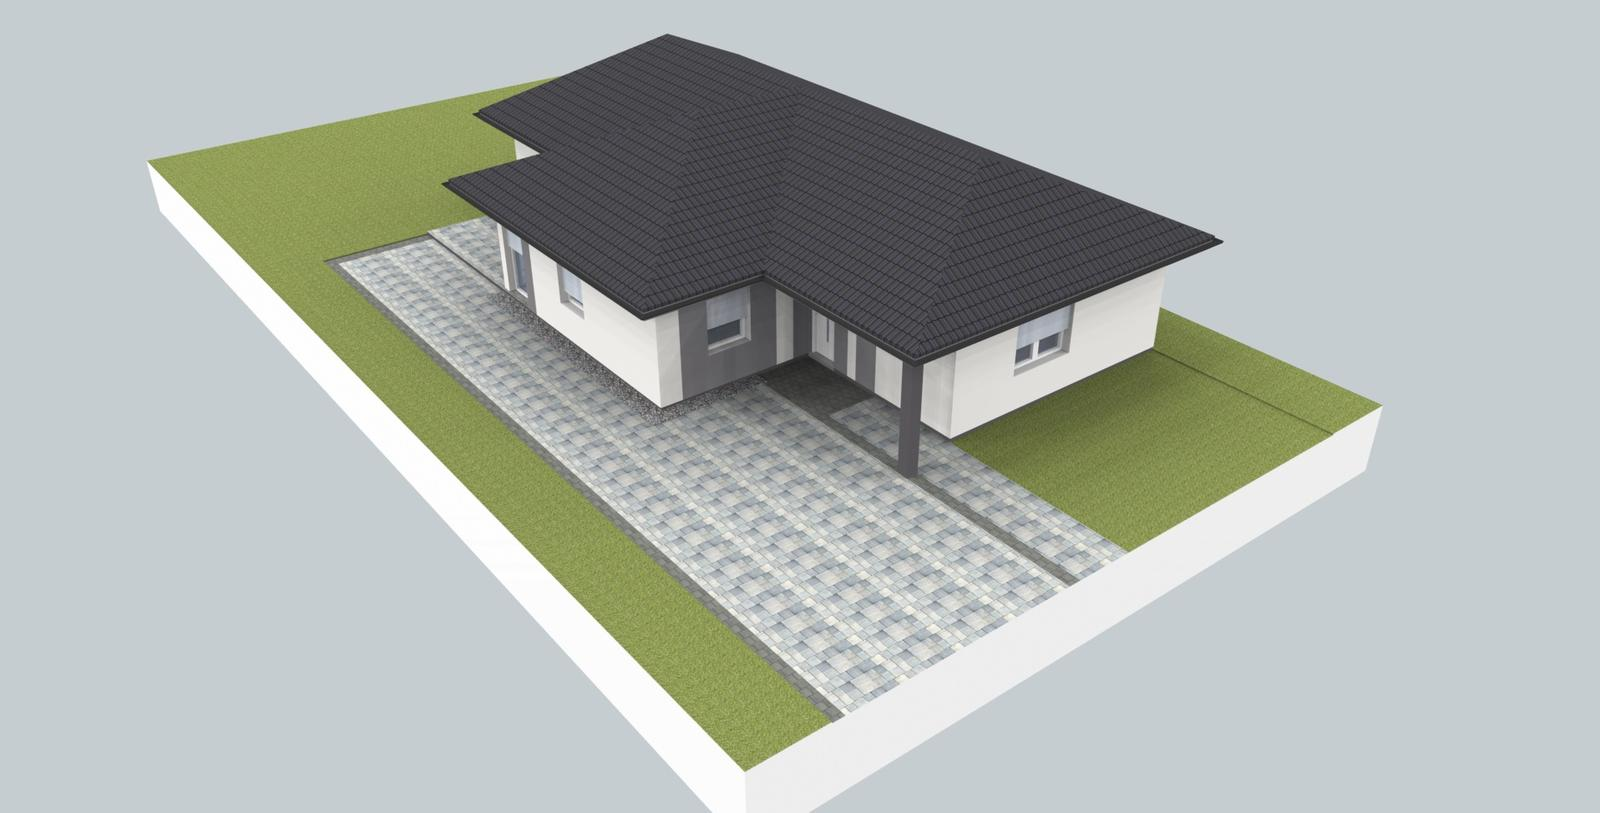 Prebiehajuce projekty - Návrh fasády